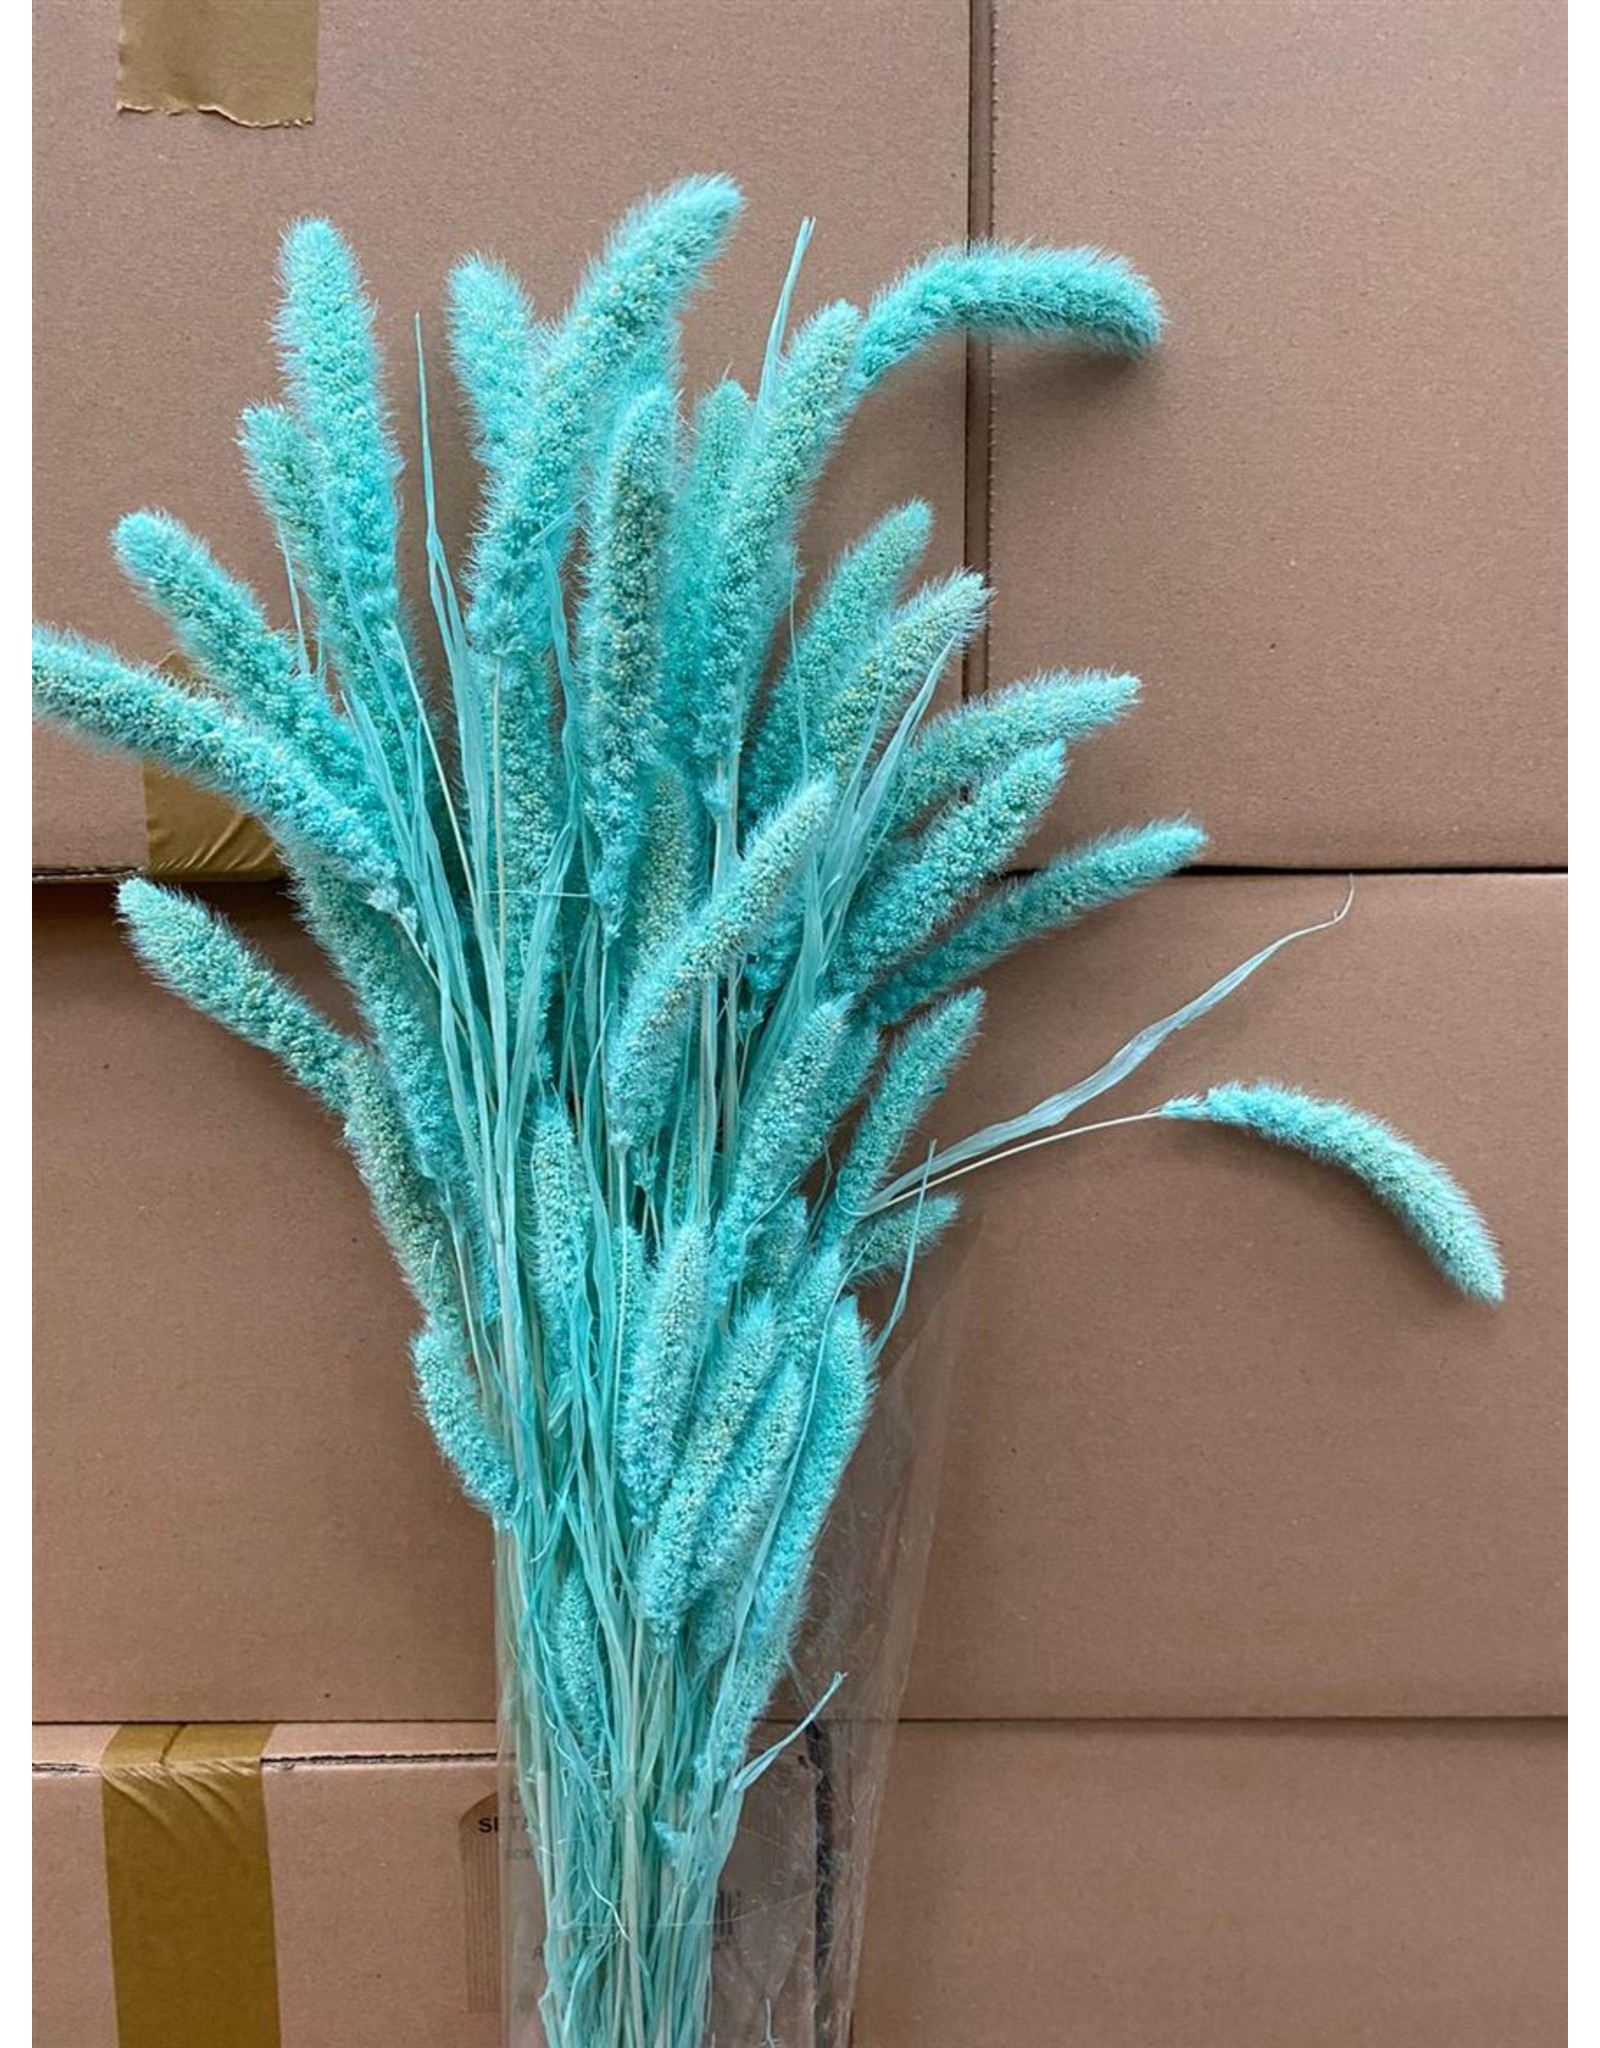 Dried Setaria Aqua Blue Bunch x 1